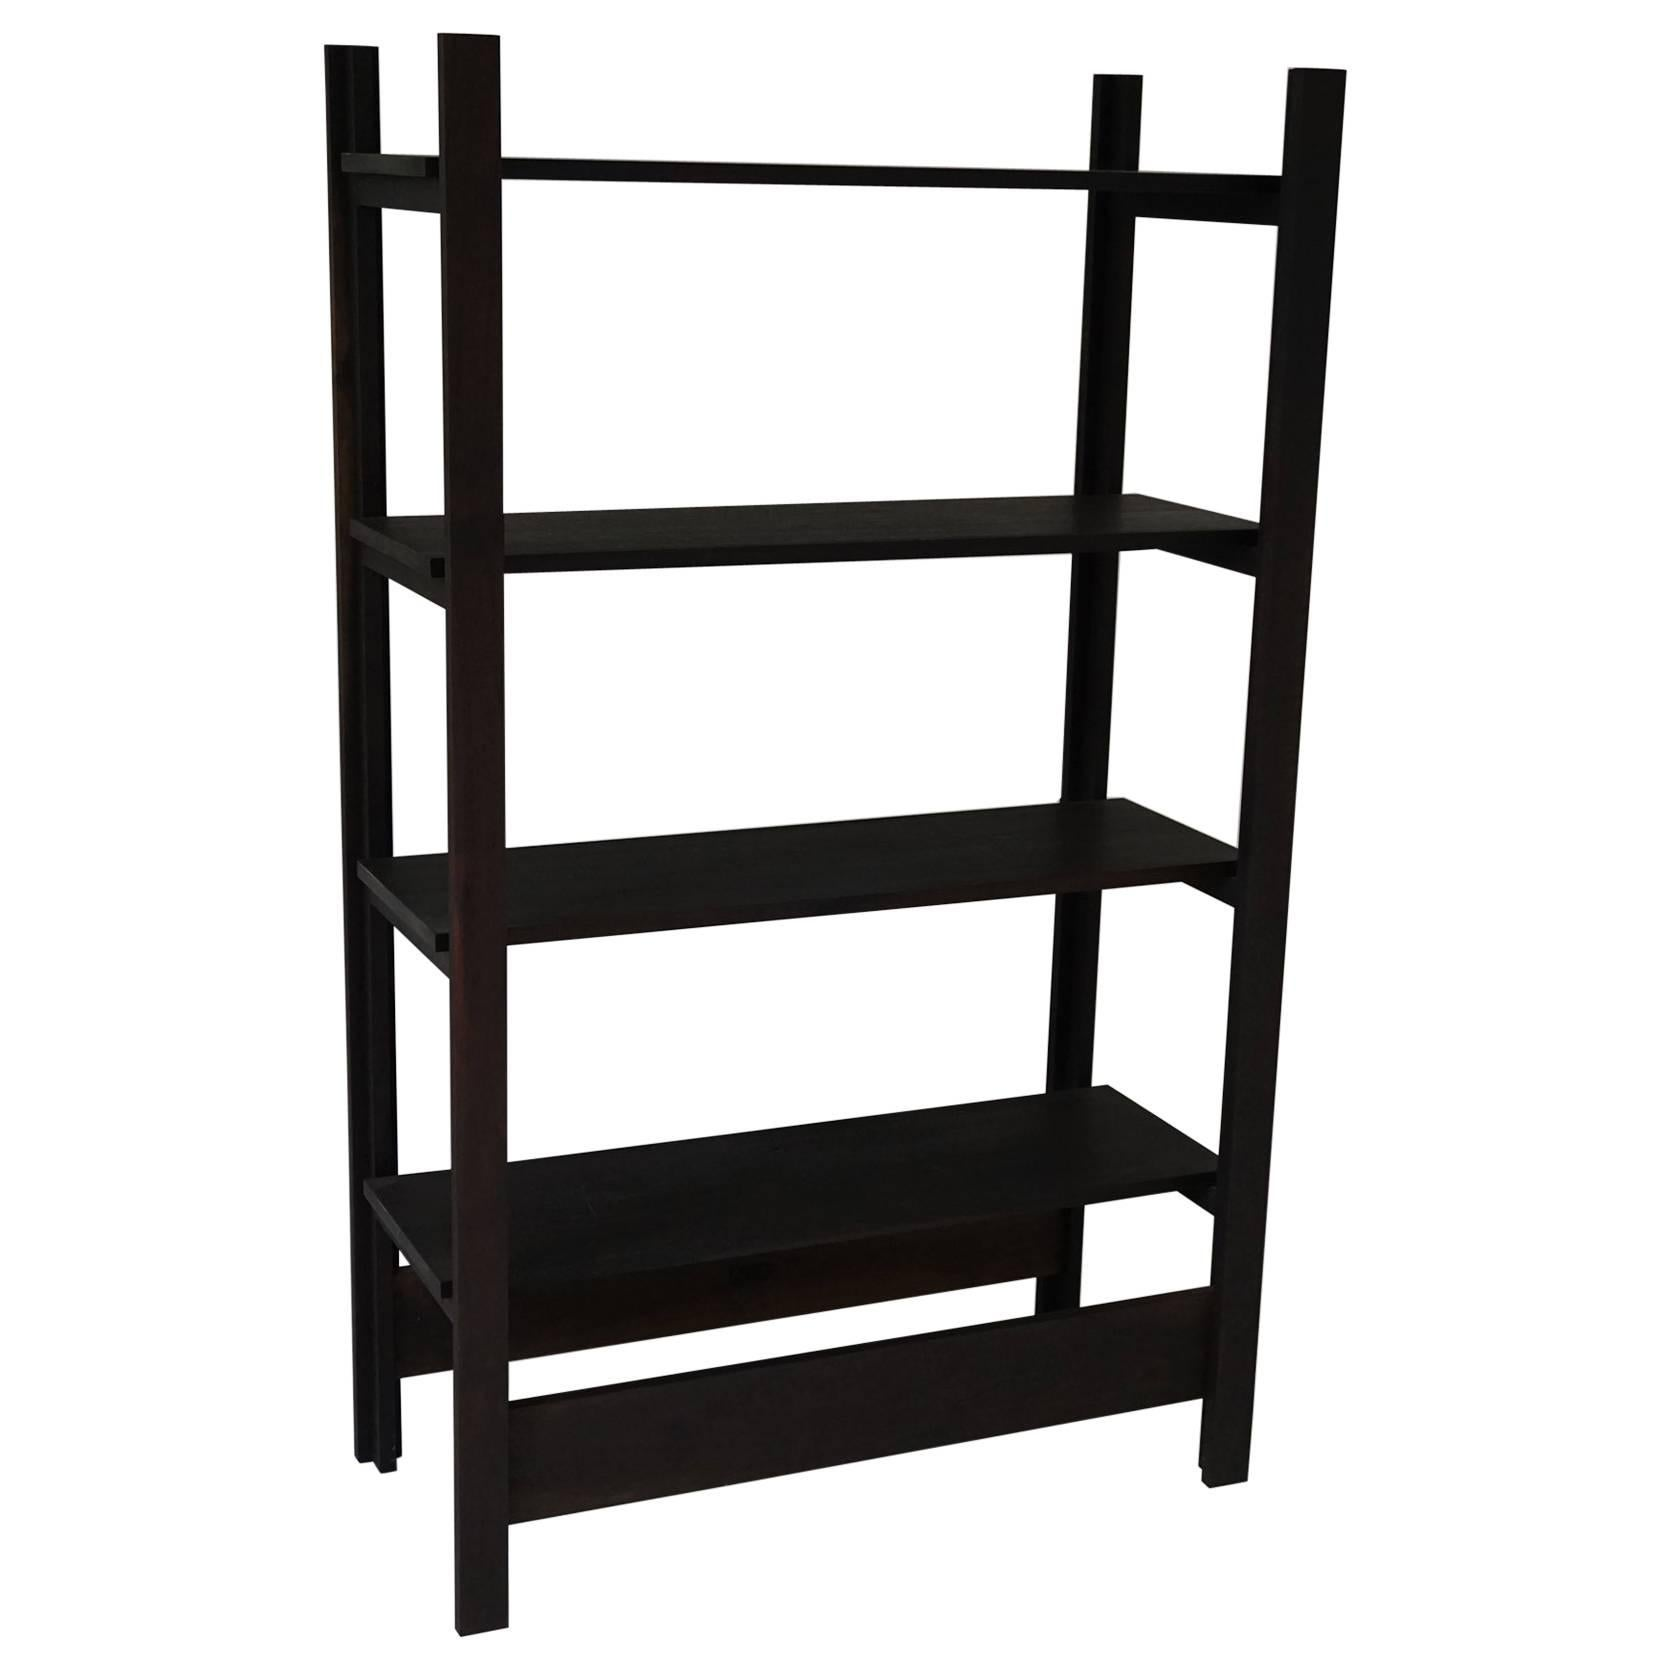 upland shelving unit walnut modern minimal bookshelf or display shelves